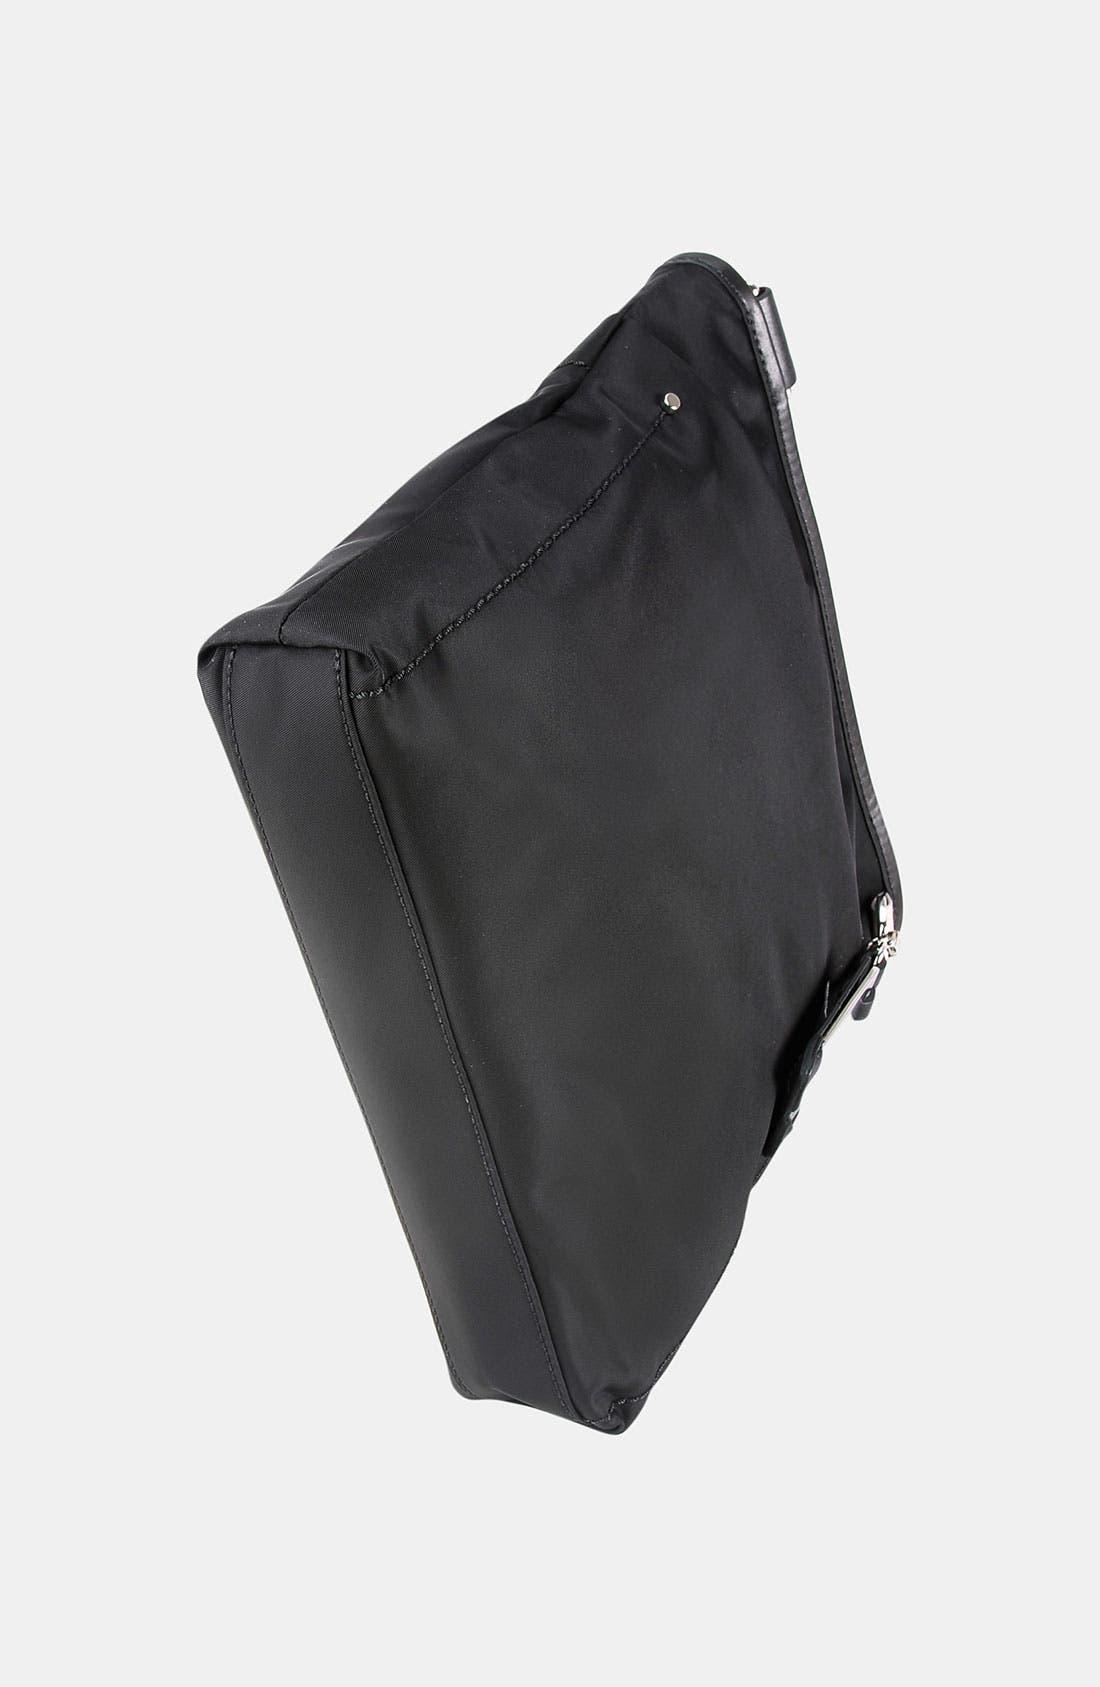 TUMI,                             'Voyageur - Capri' Crossbody Bag,                             Alternate thumbnail 4, color,                             001